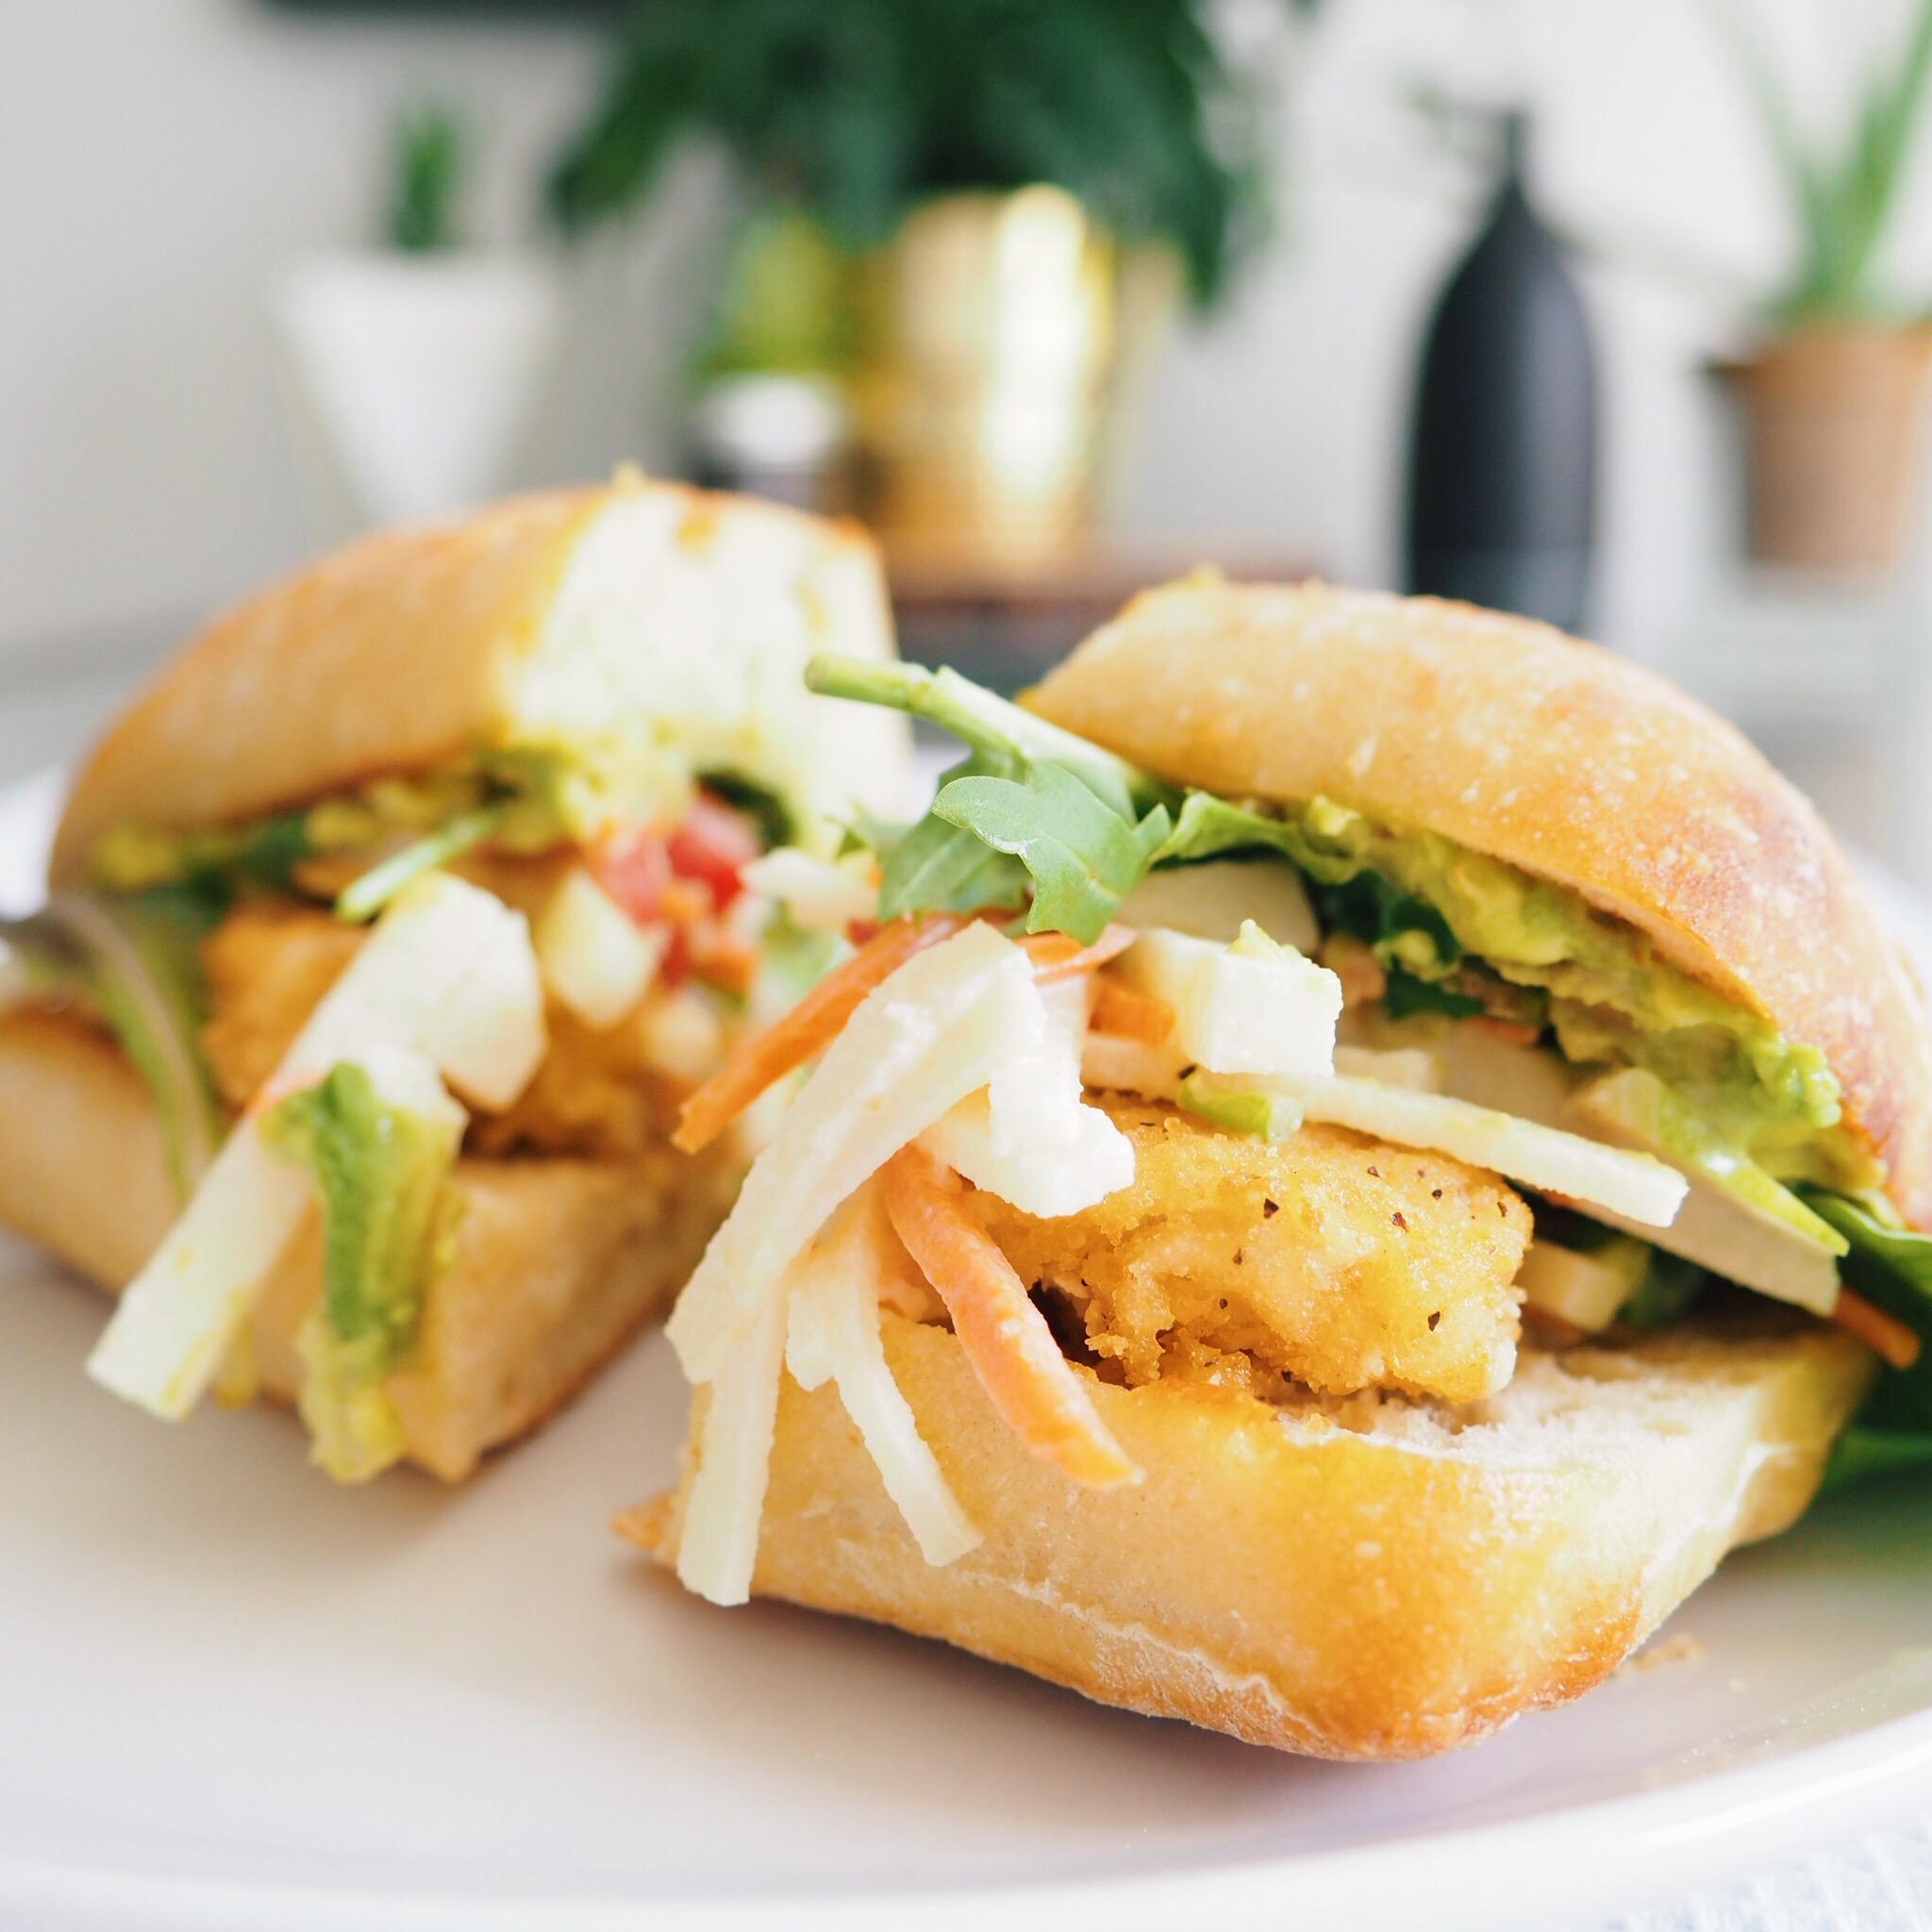 Vegan Crispy Chicken Sandwich